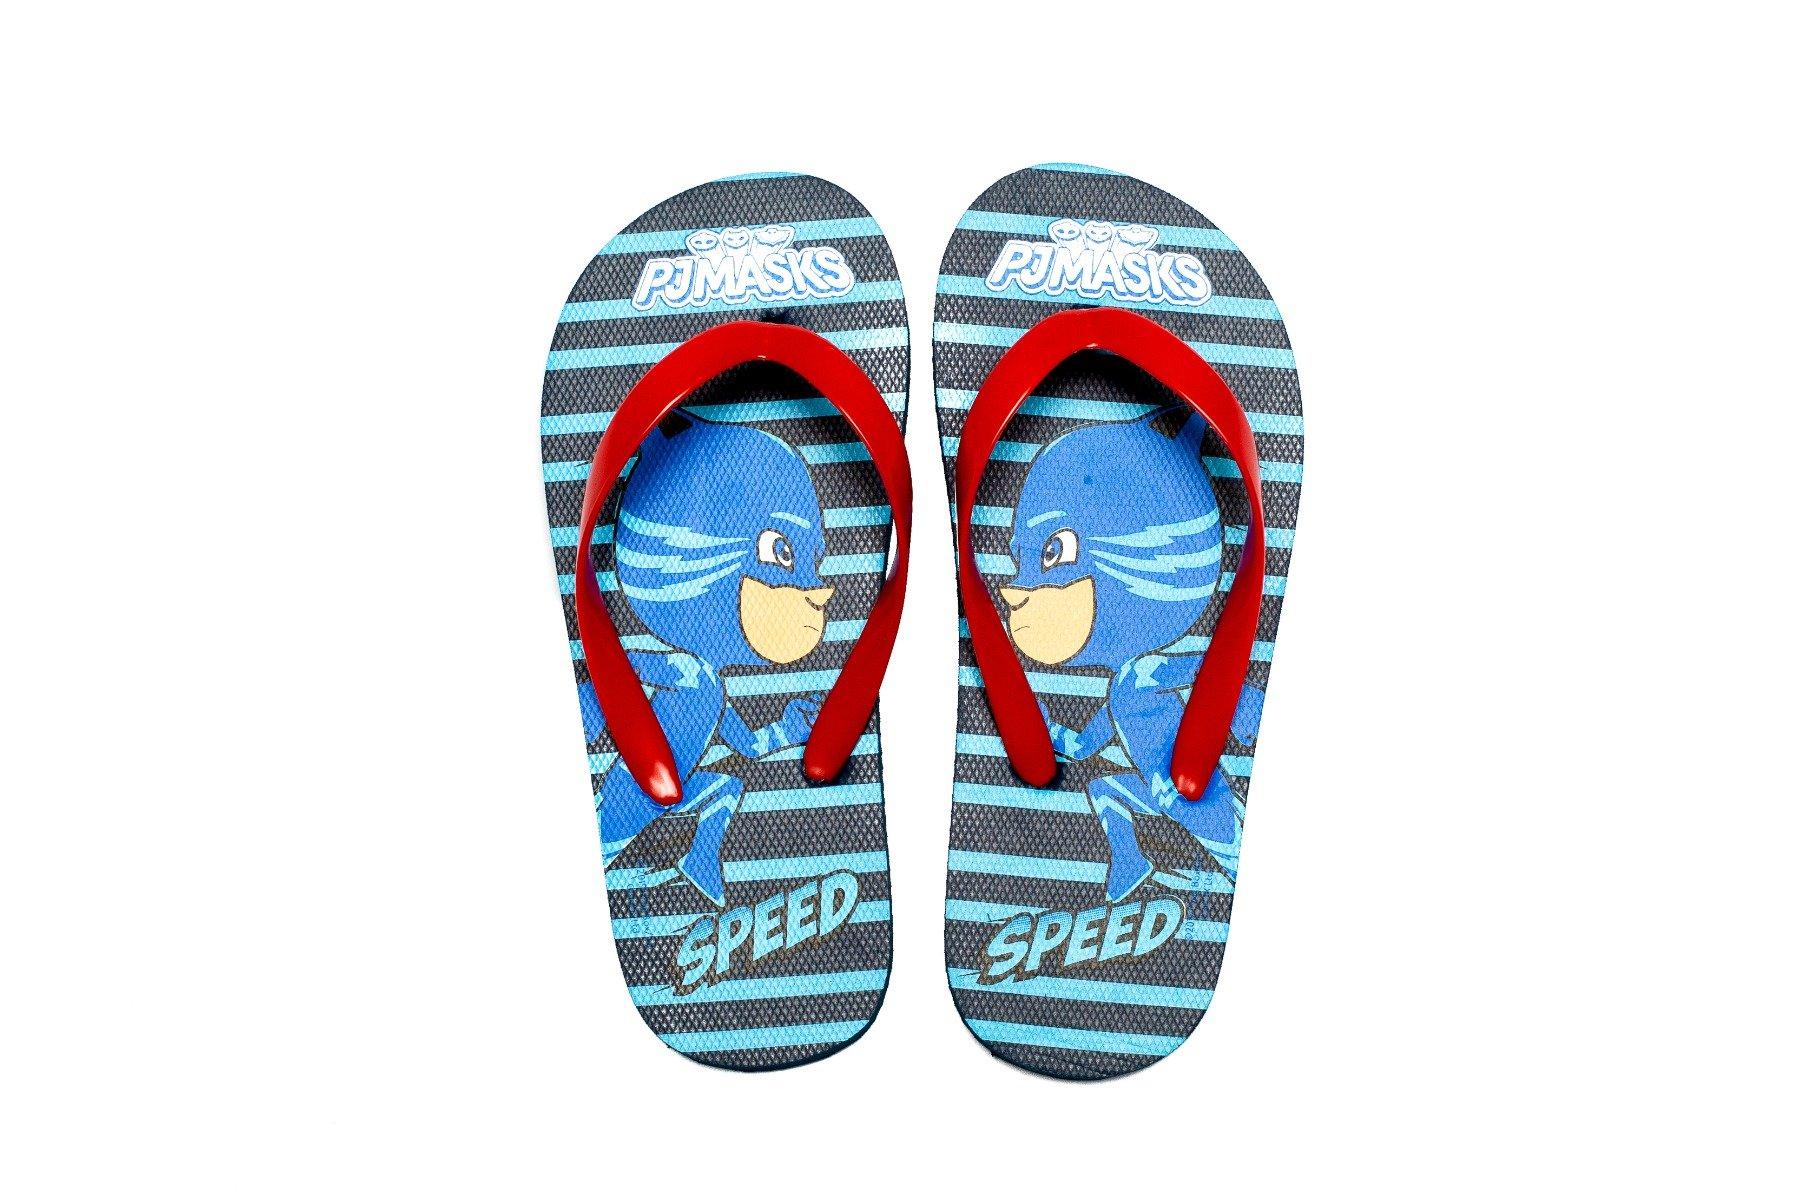 Papuci baieti Pj Masks, Speed, Rosu